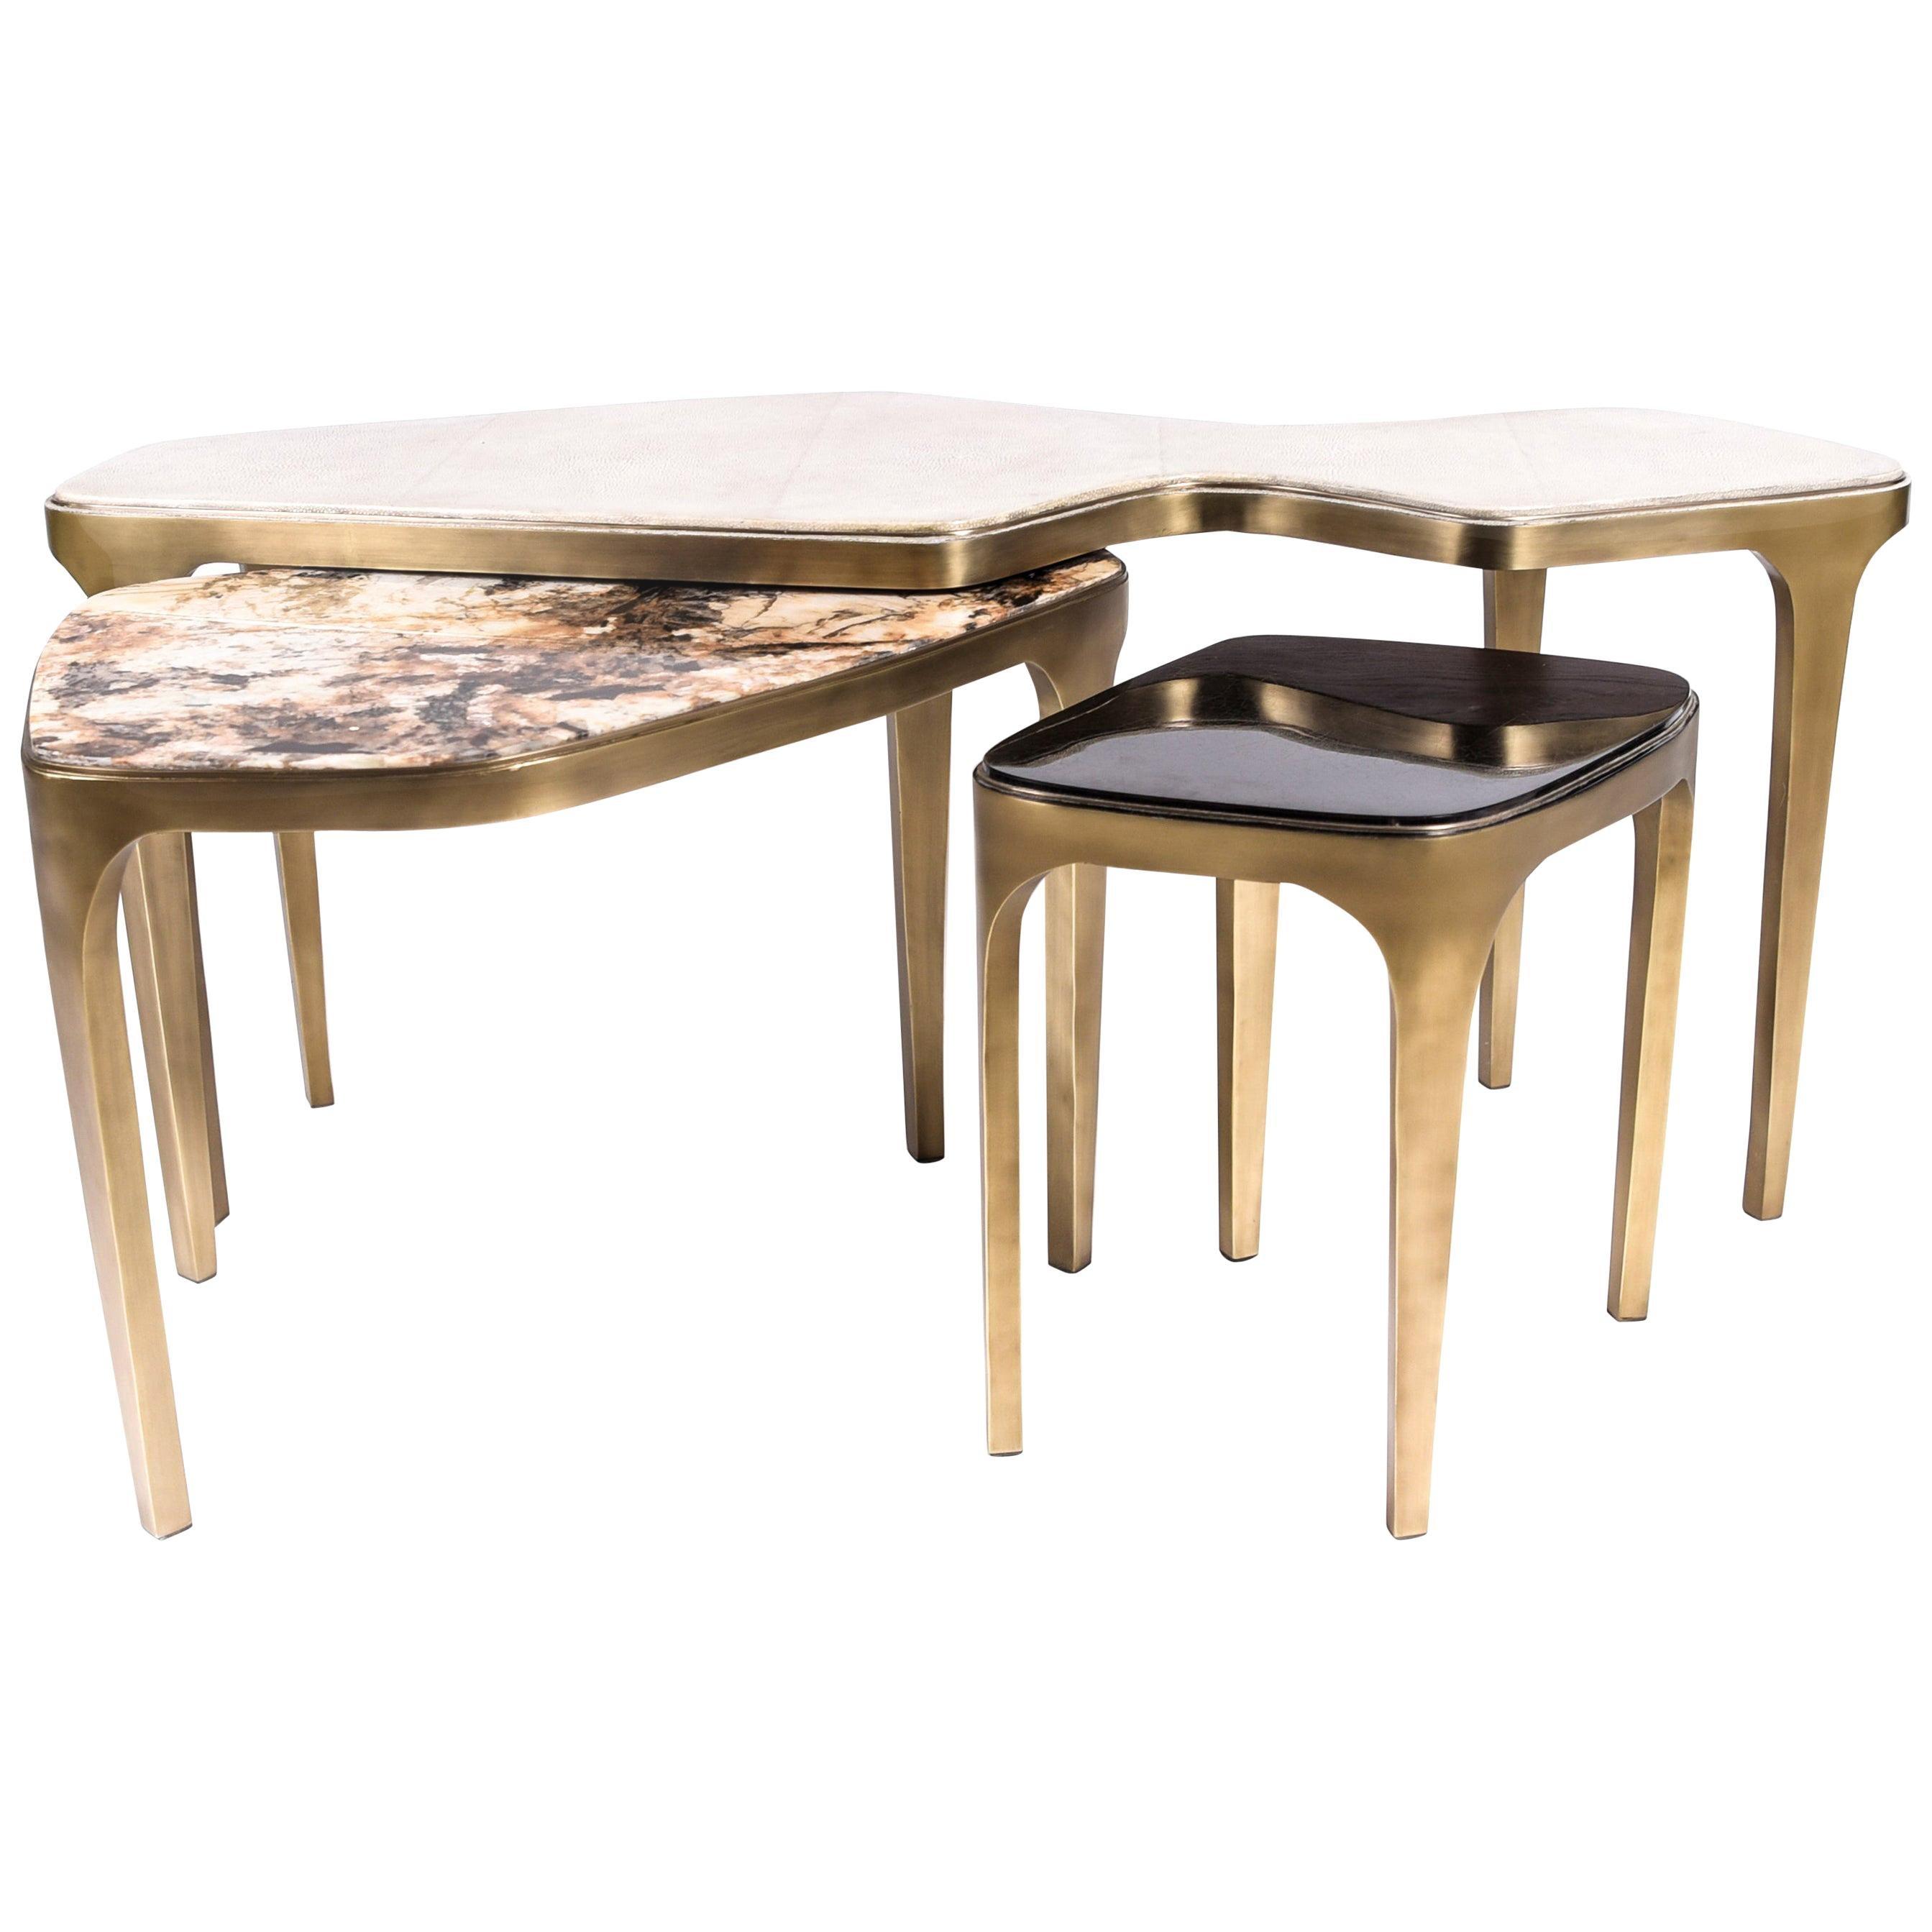 Set of 3 Cosmos Nesting Coffee Tables in Shagreen, Shell & Hwana R & Y Augousti